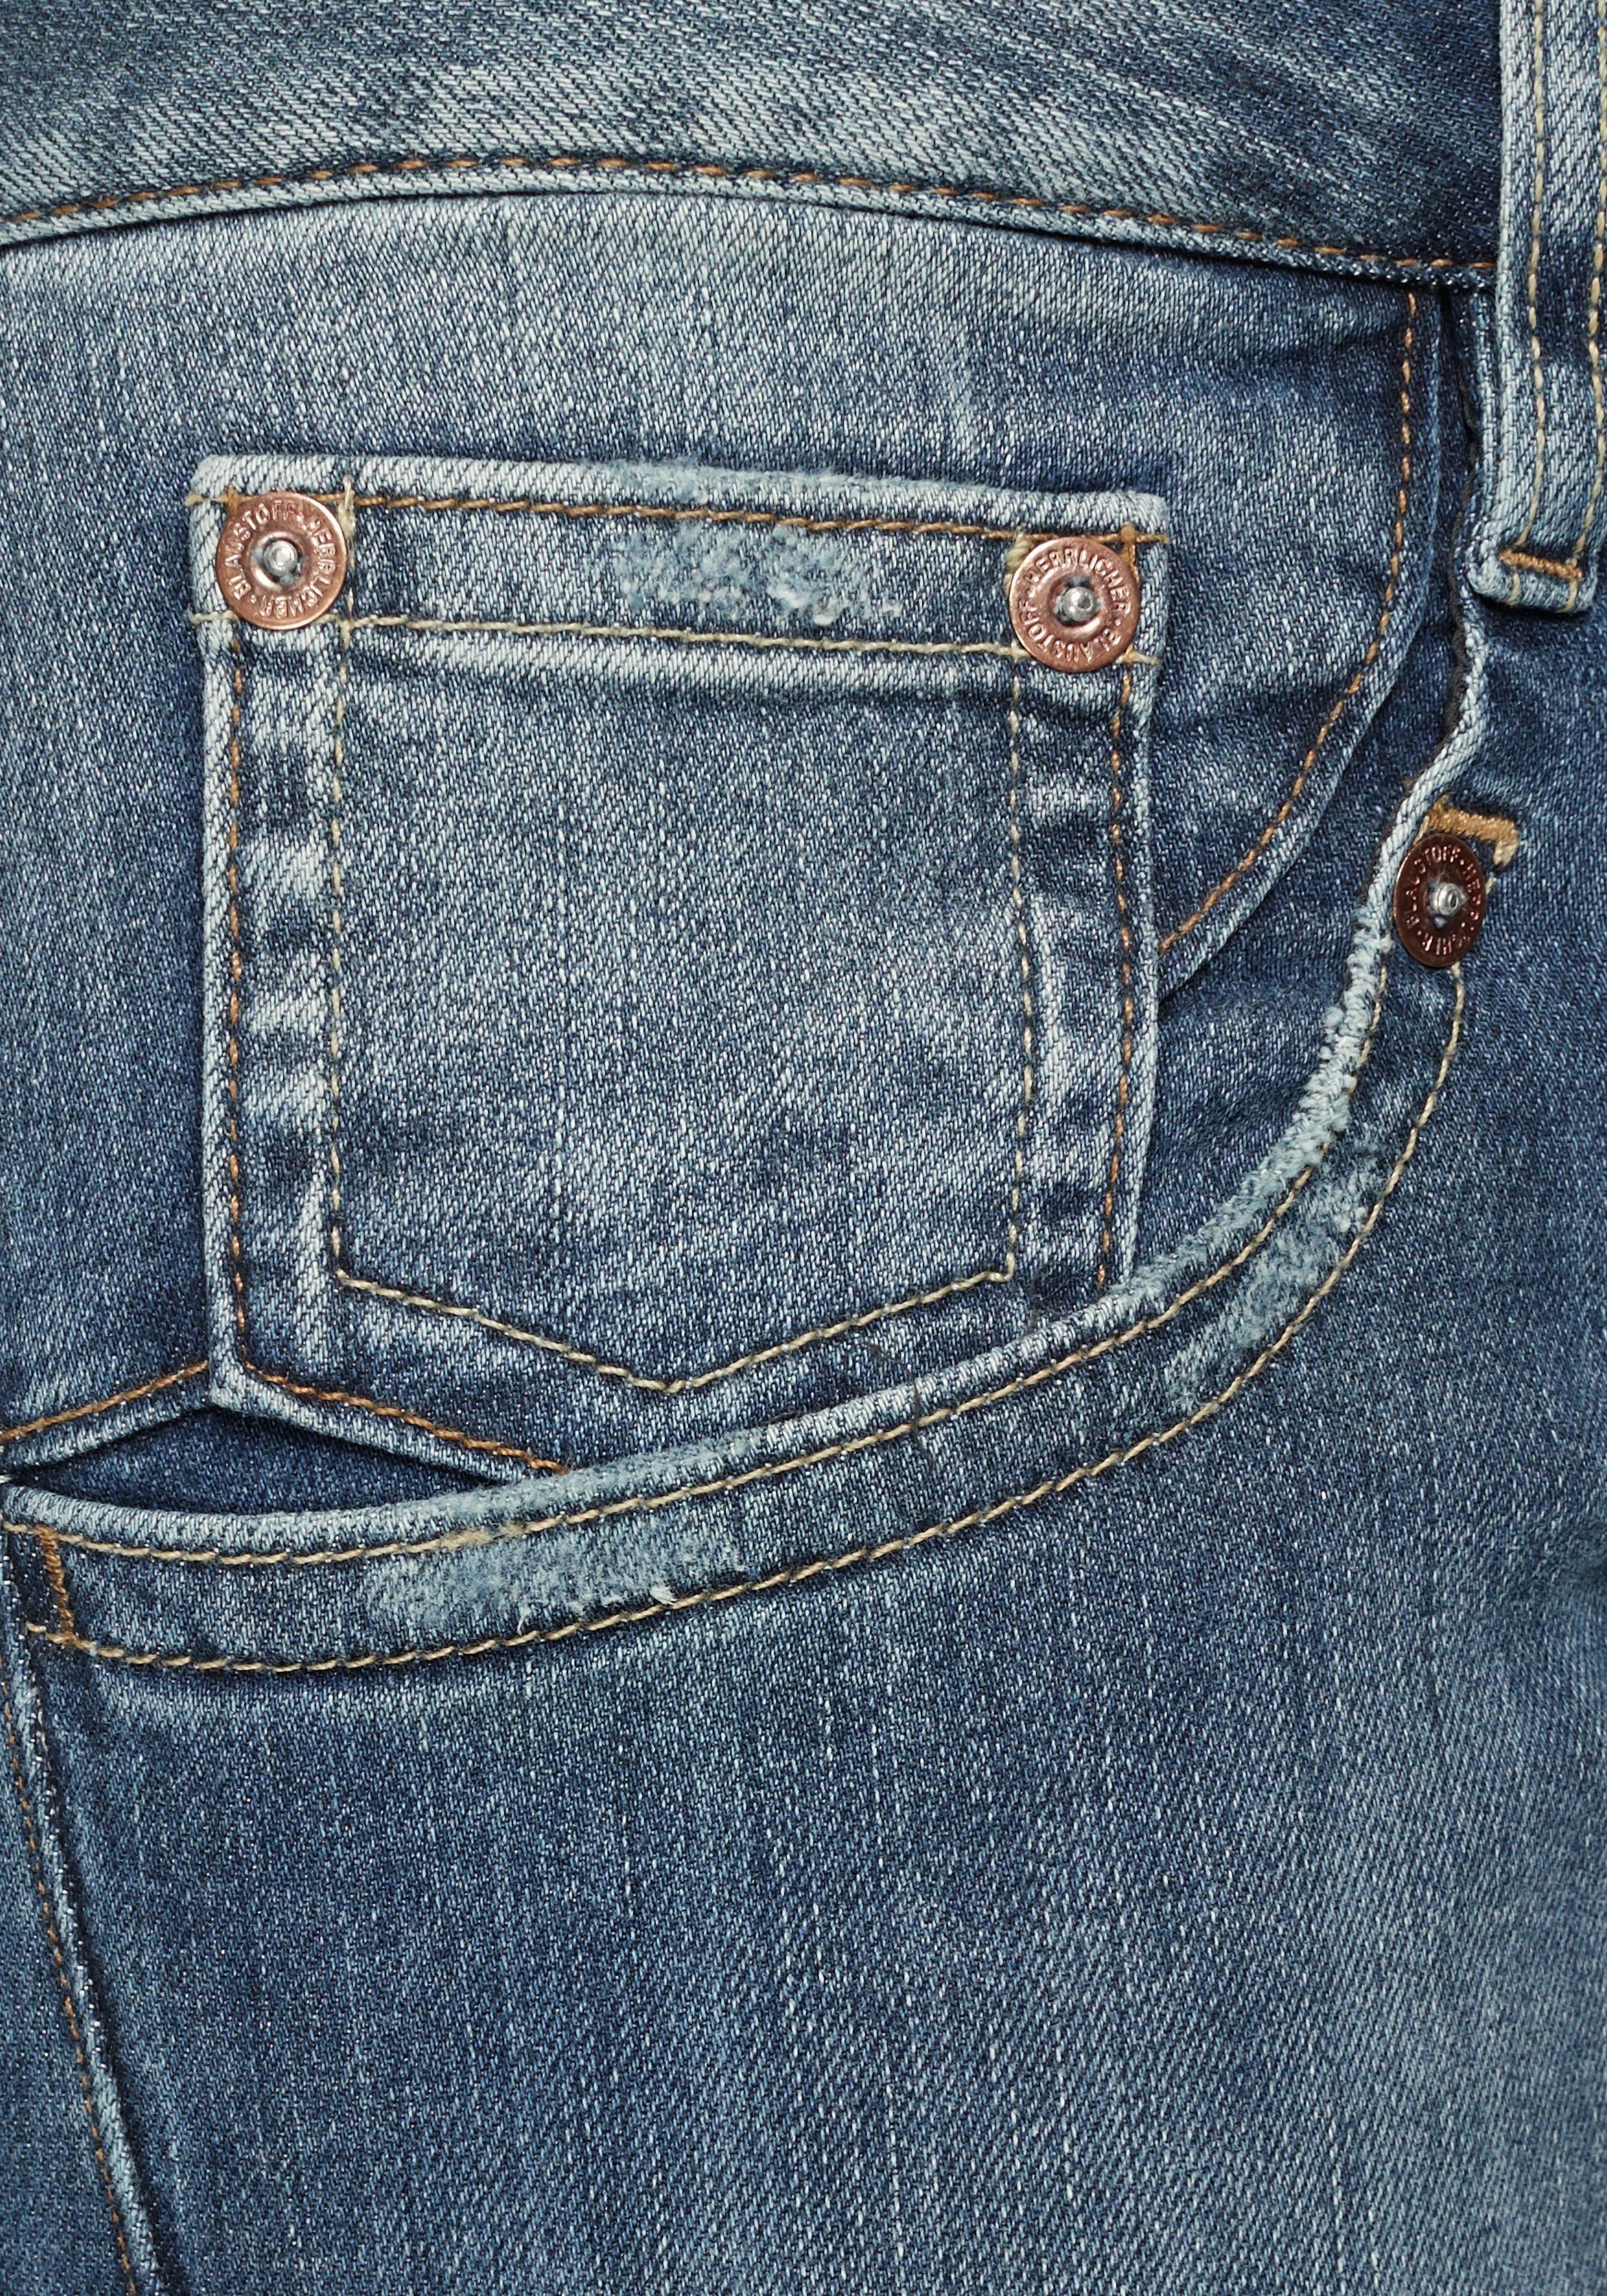 Makkelijk Herrlicher Gekocht Slim Jeansshyra Fit 8nwOPXk0